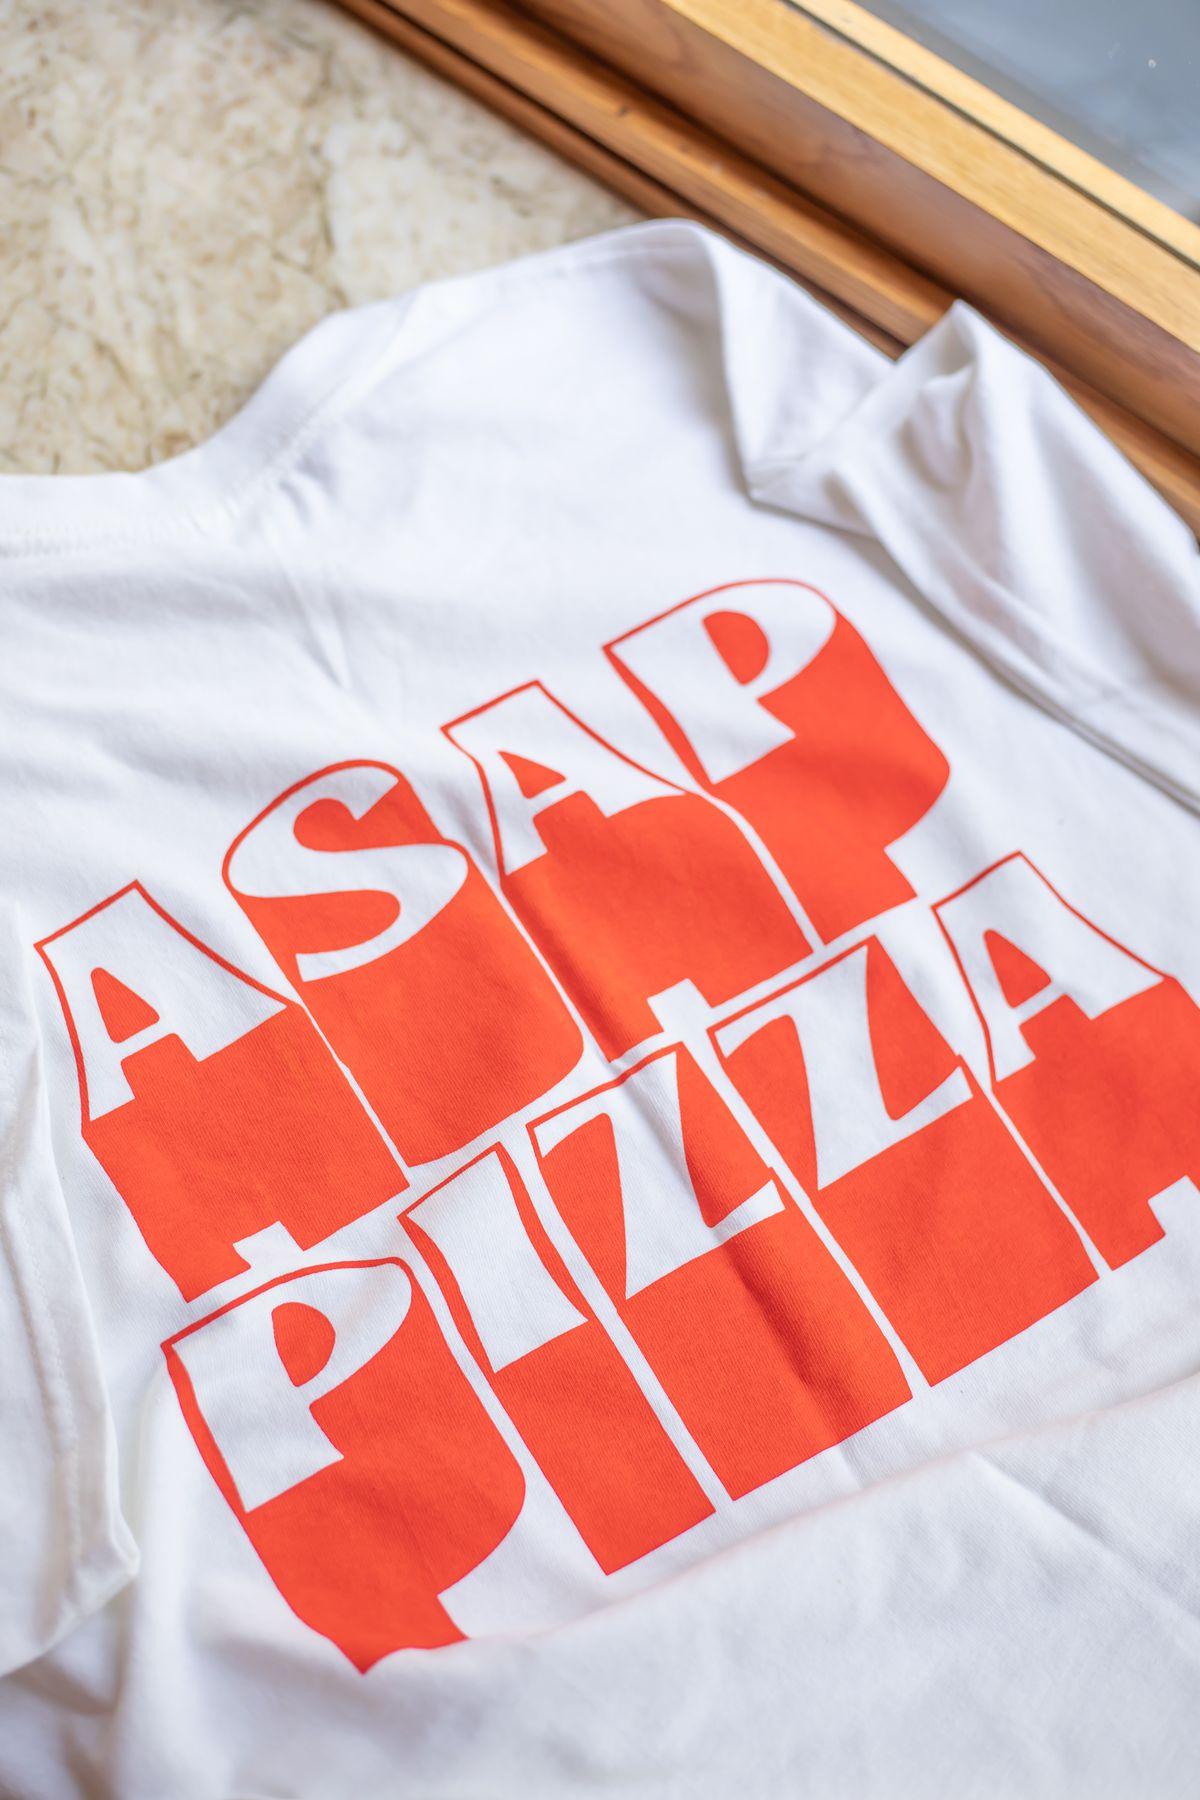 A pizza t-shirt from ASAP Pizza